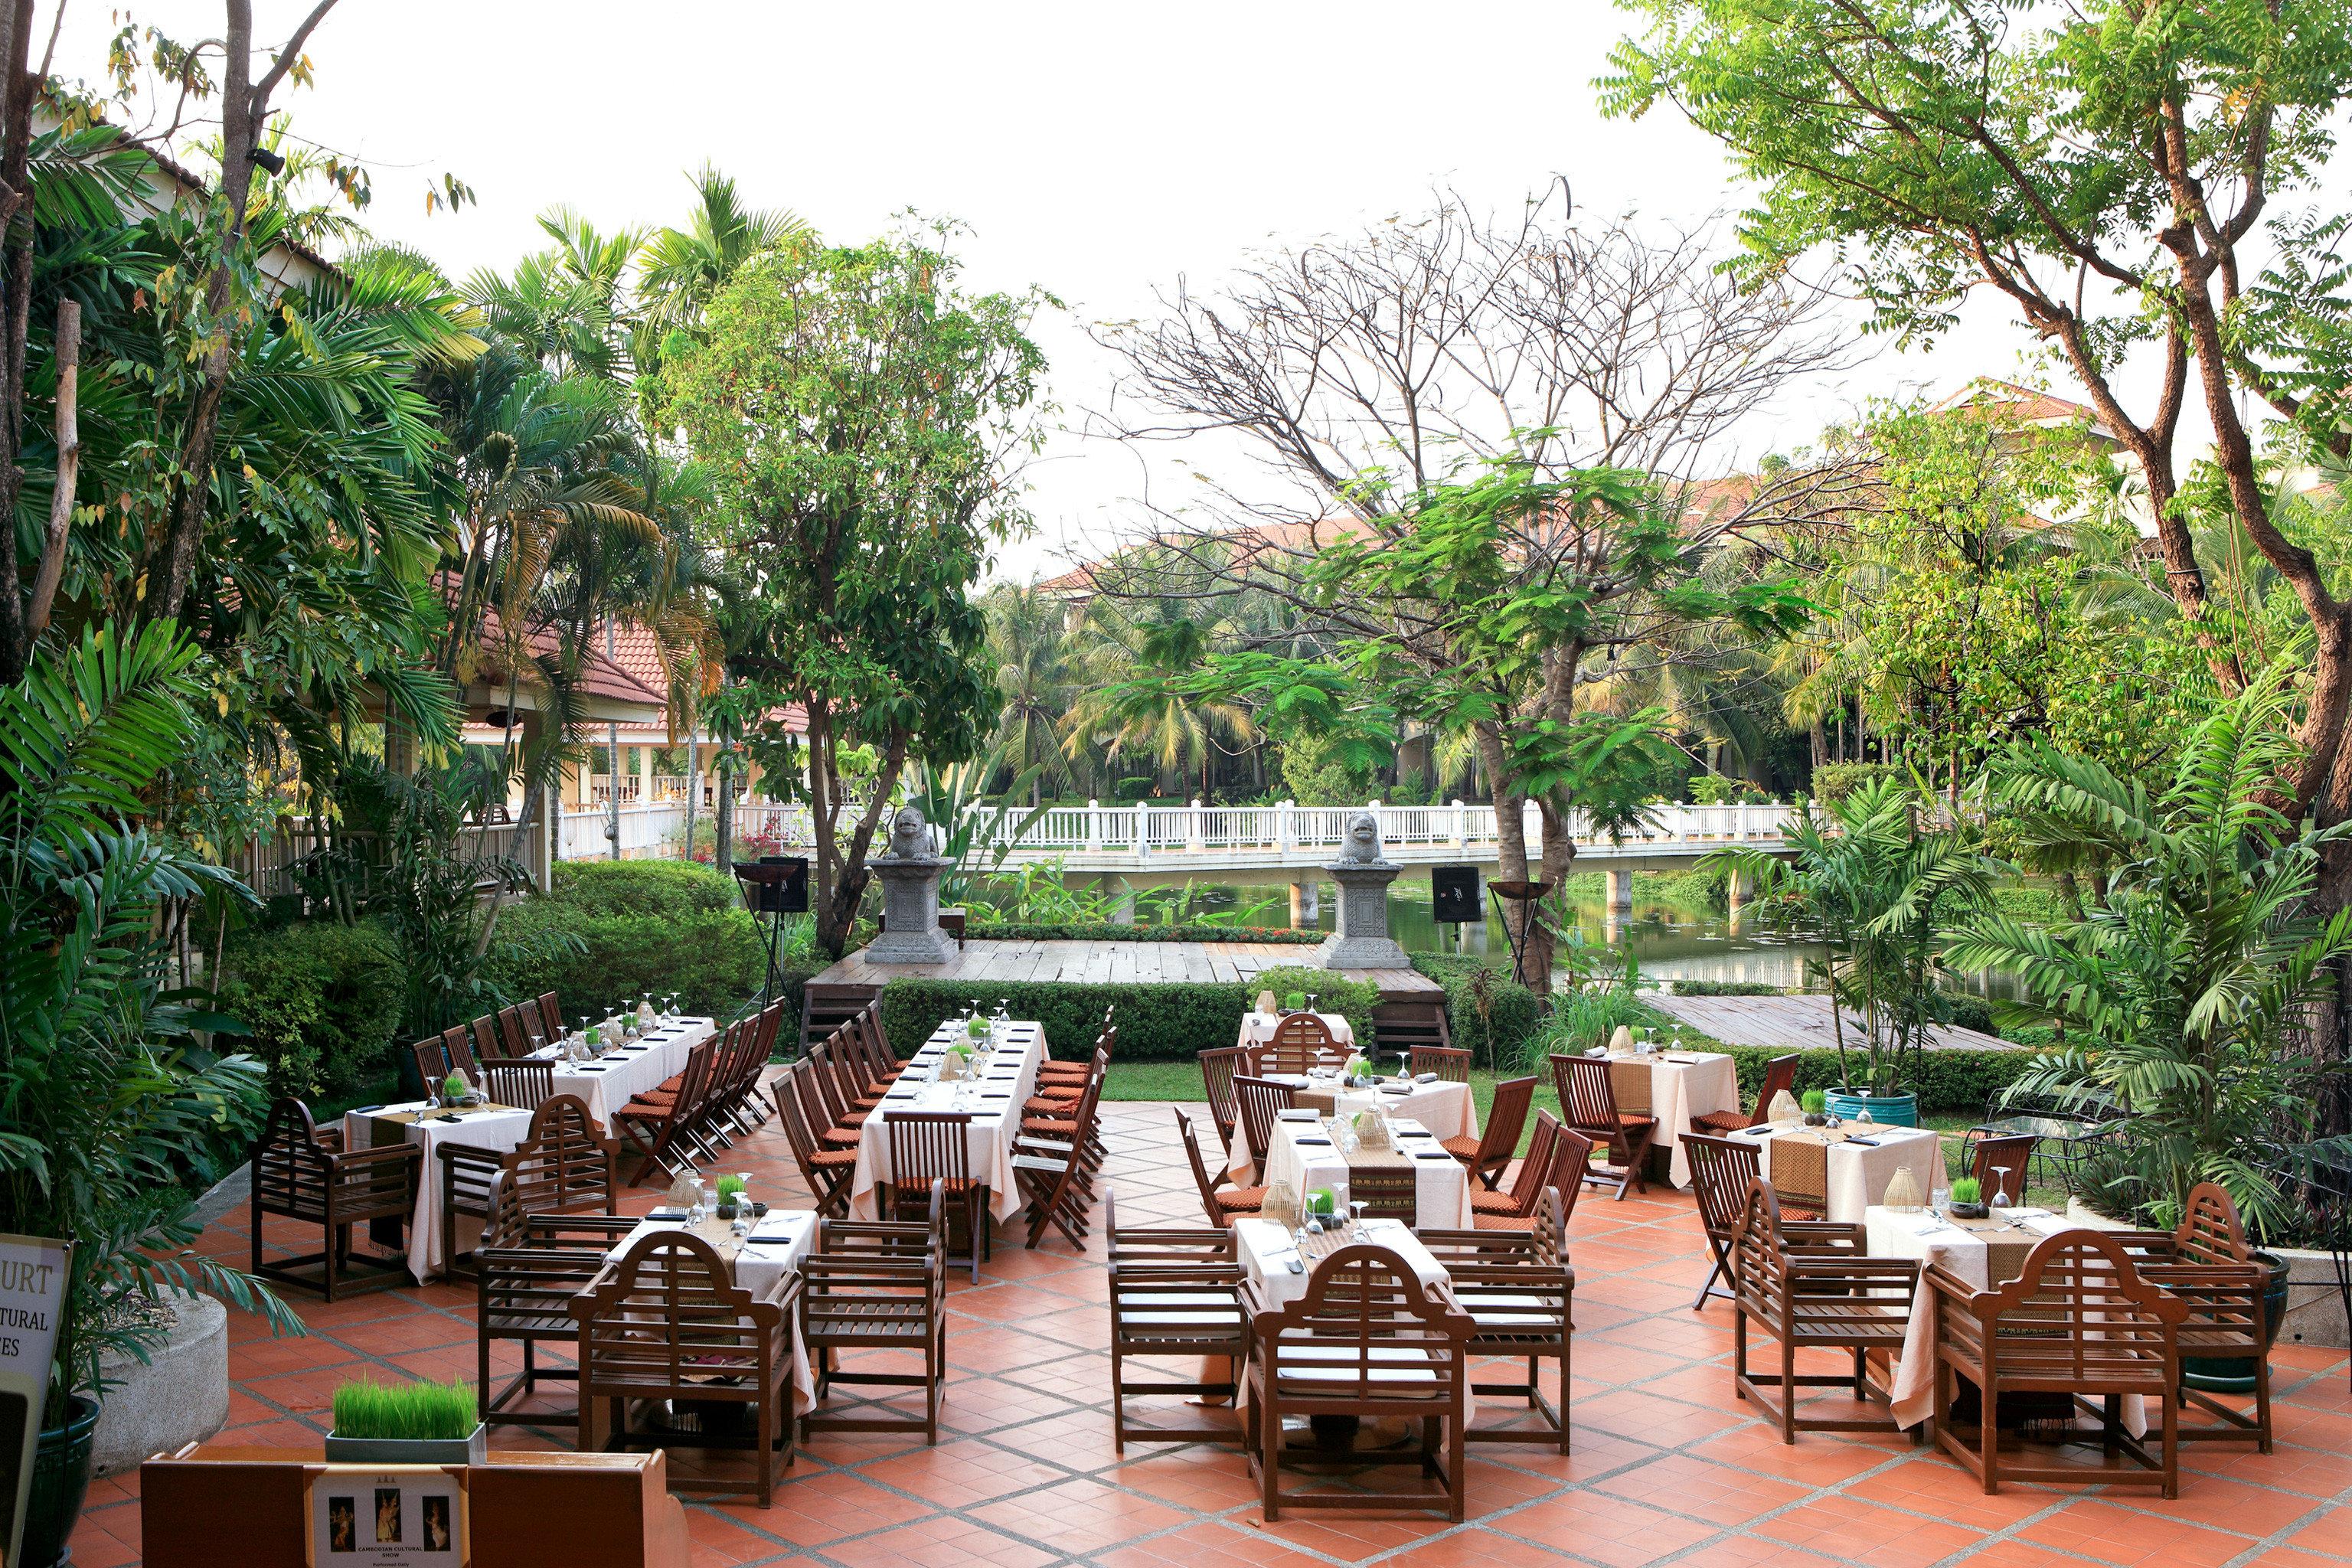 Dining Drink Eat Family Resort Scenic views tree ground property restaurant plaza Courtyard condominium Jungle Garden